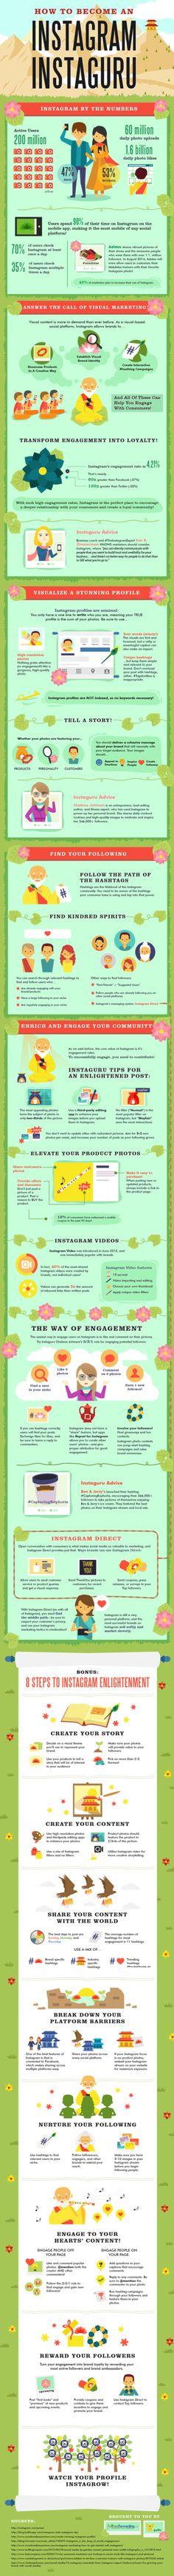 Social Media Marketing On Instagram. How to Become An Instaguru? #socialmedia #infographic #marketing